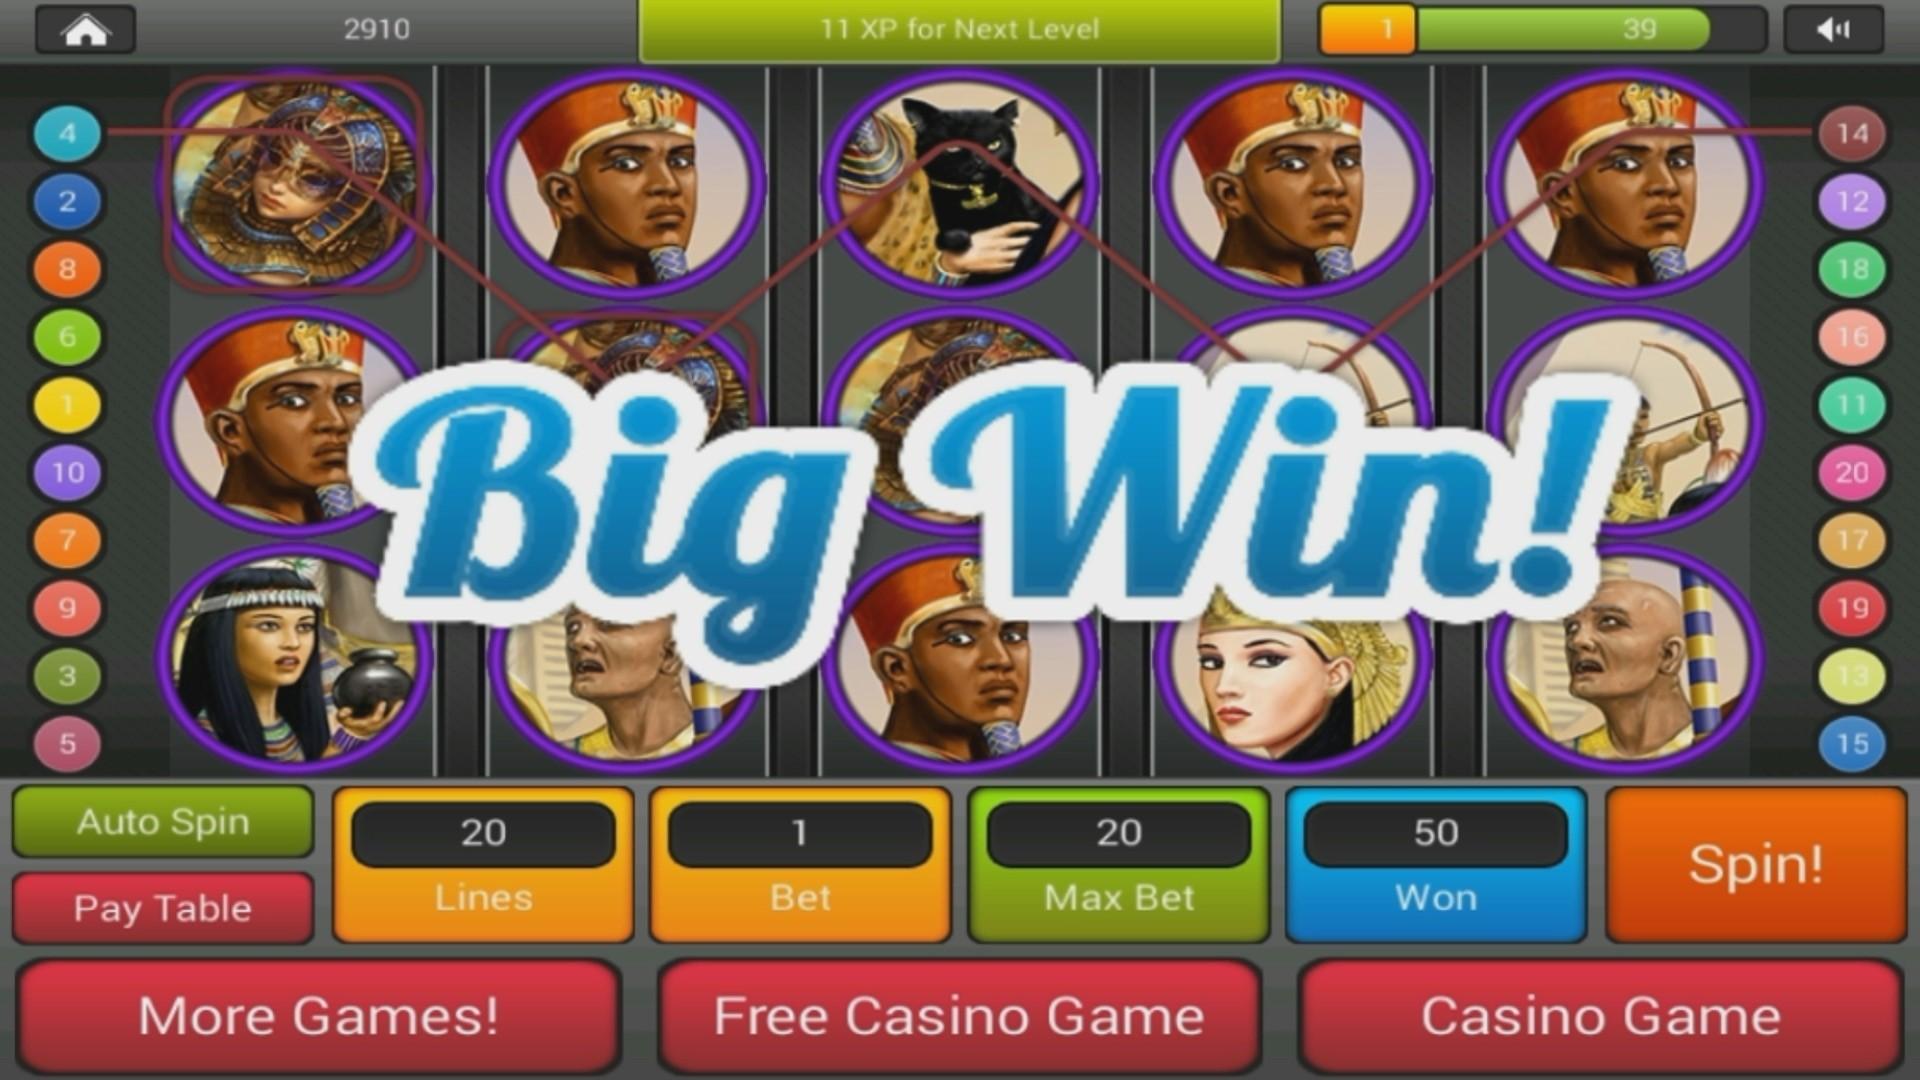 Cheques Bitcoins casino juegos gratis slot-703460